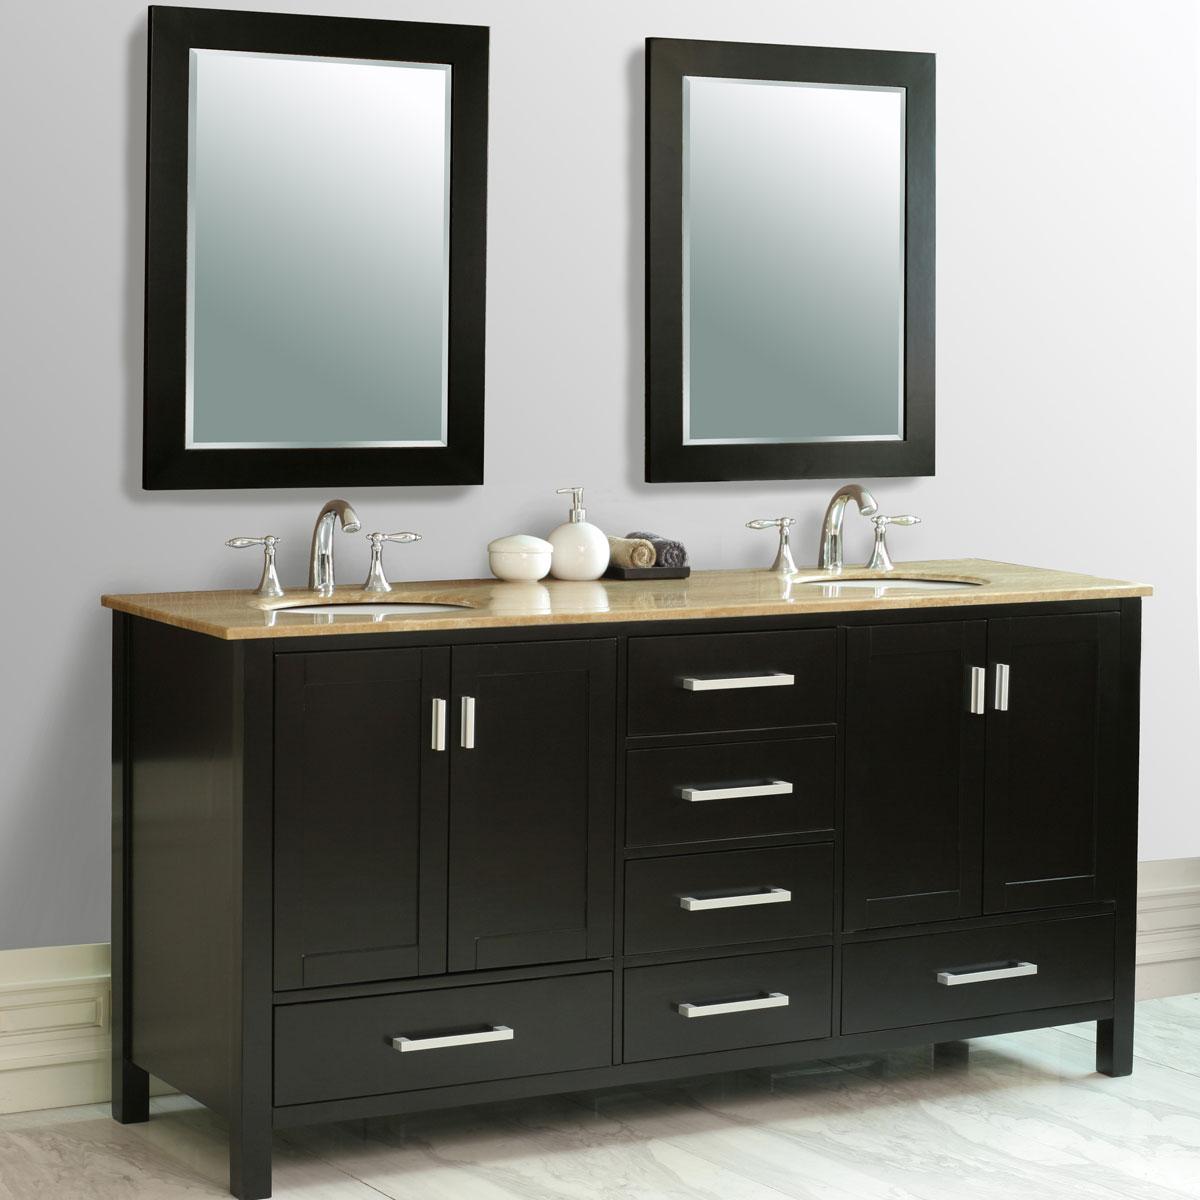 "72"" Malibu Double Vanity - with Travertine Marble Top"